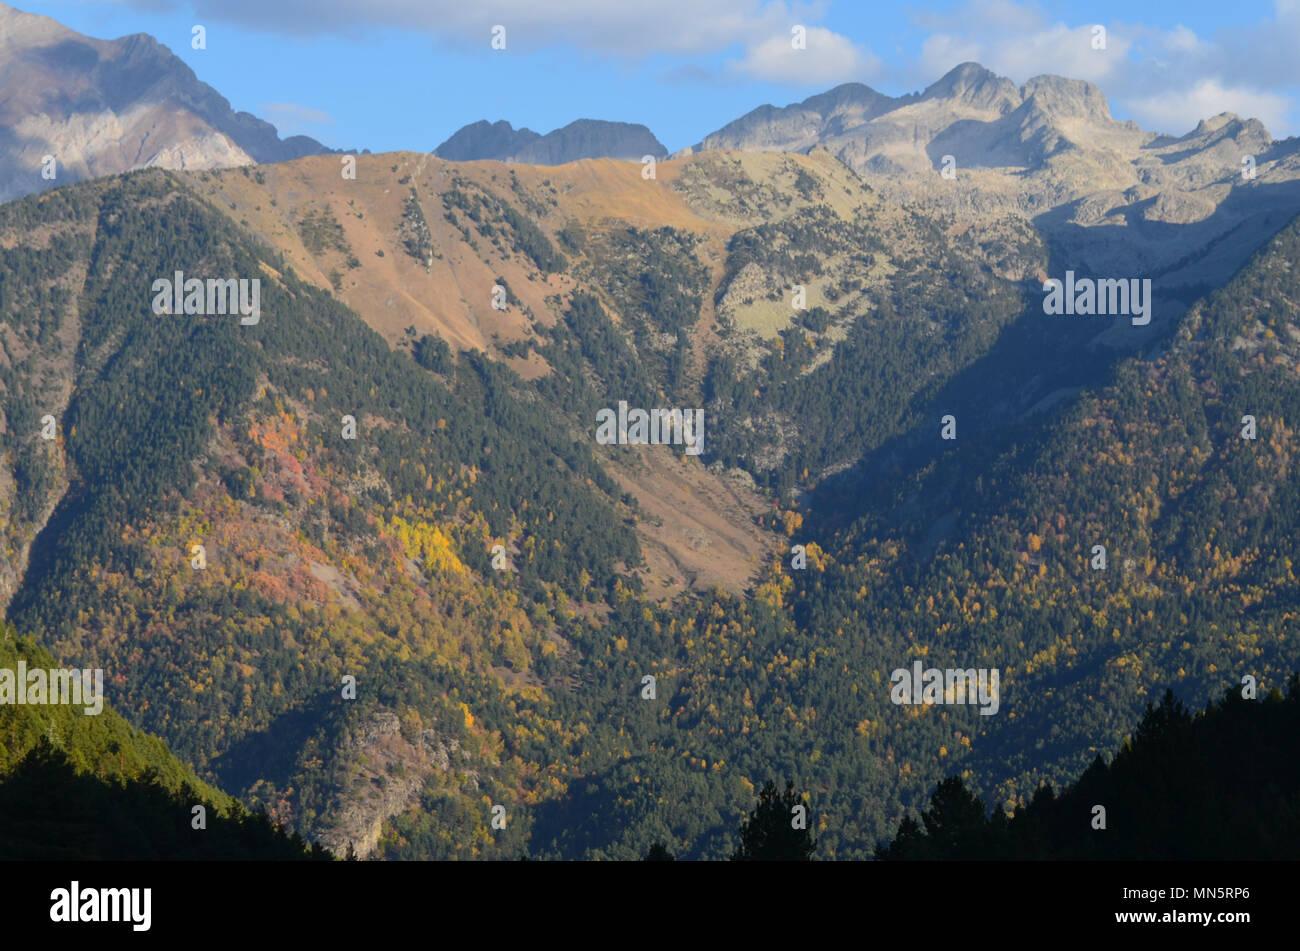 The Posets-Maladeta Natural Park in the Posets massif, Aragón, Spanish Pyrenees Stock Photo